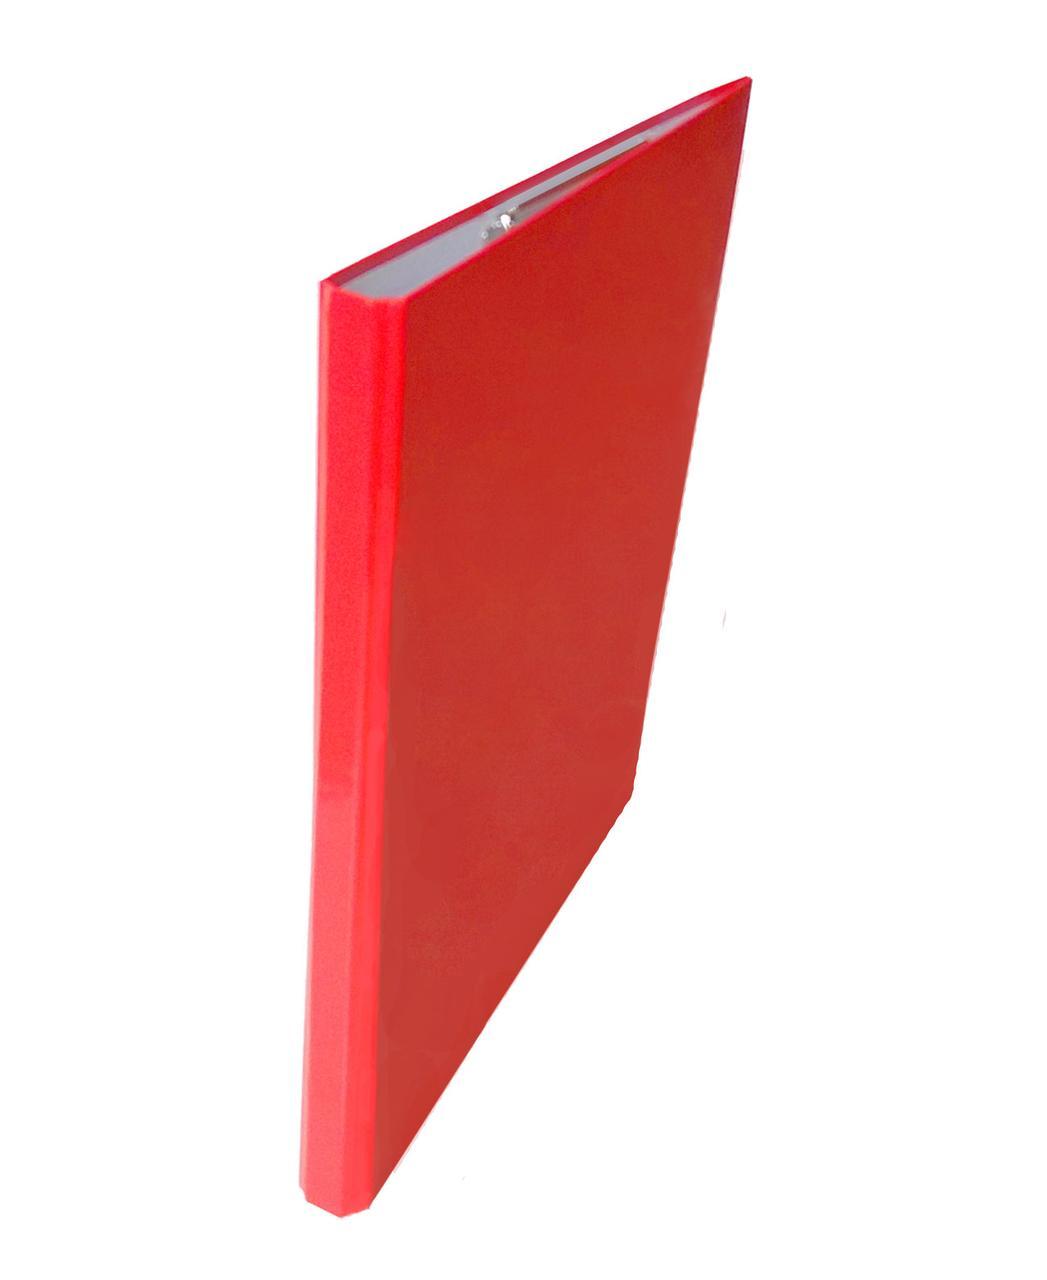 Папка с зажимом Clipboard, А4, 25 мм, PP-покрытие